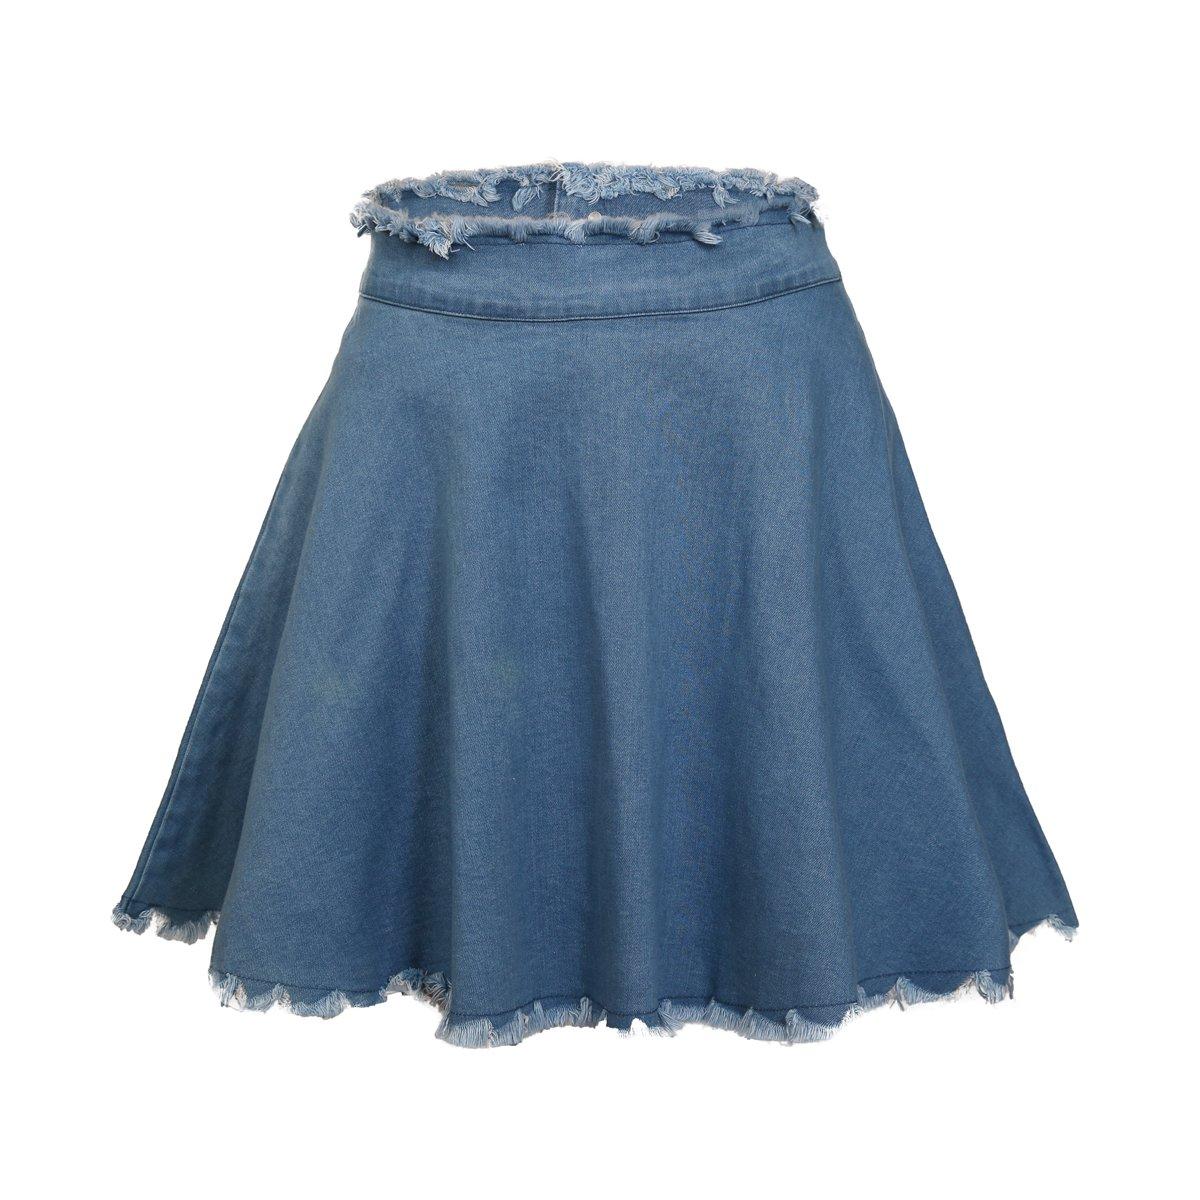 SUWIINA Women's Denim Jean Casual Basic Frayed Hem Pleated Ruffle Fringed Mini Short Skirt